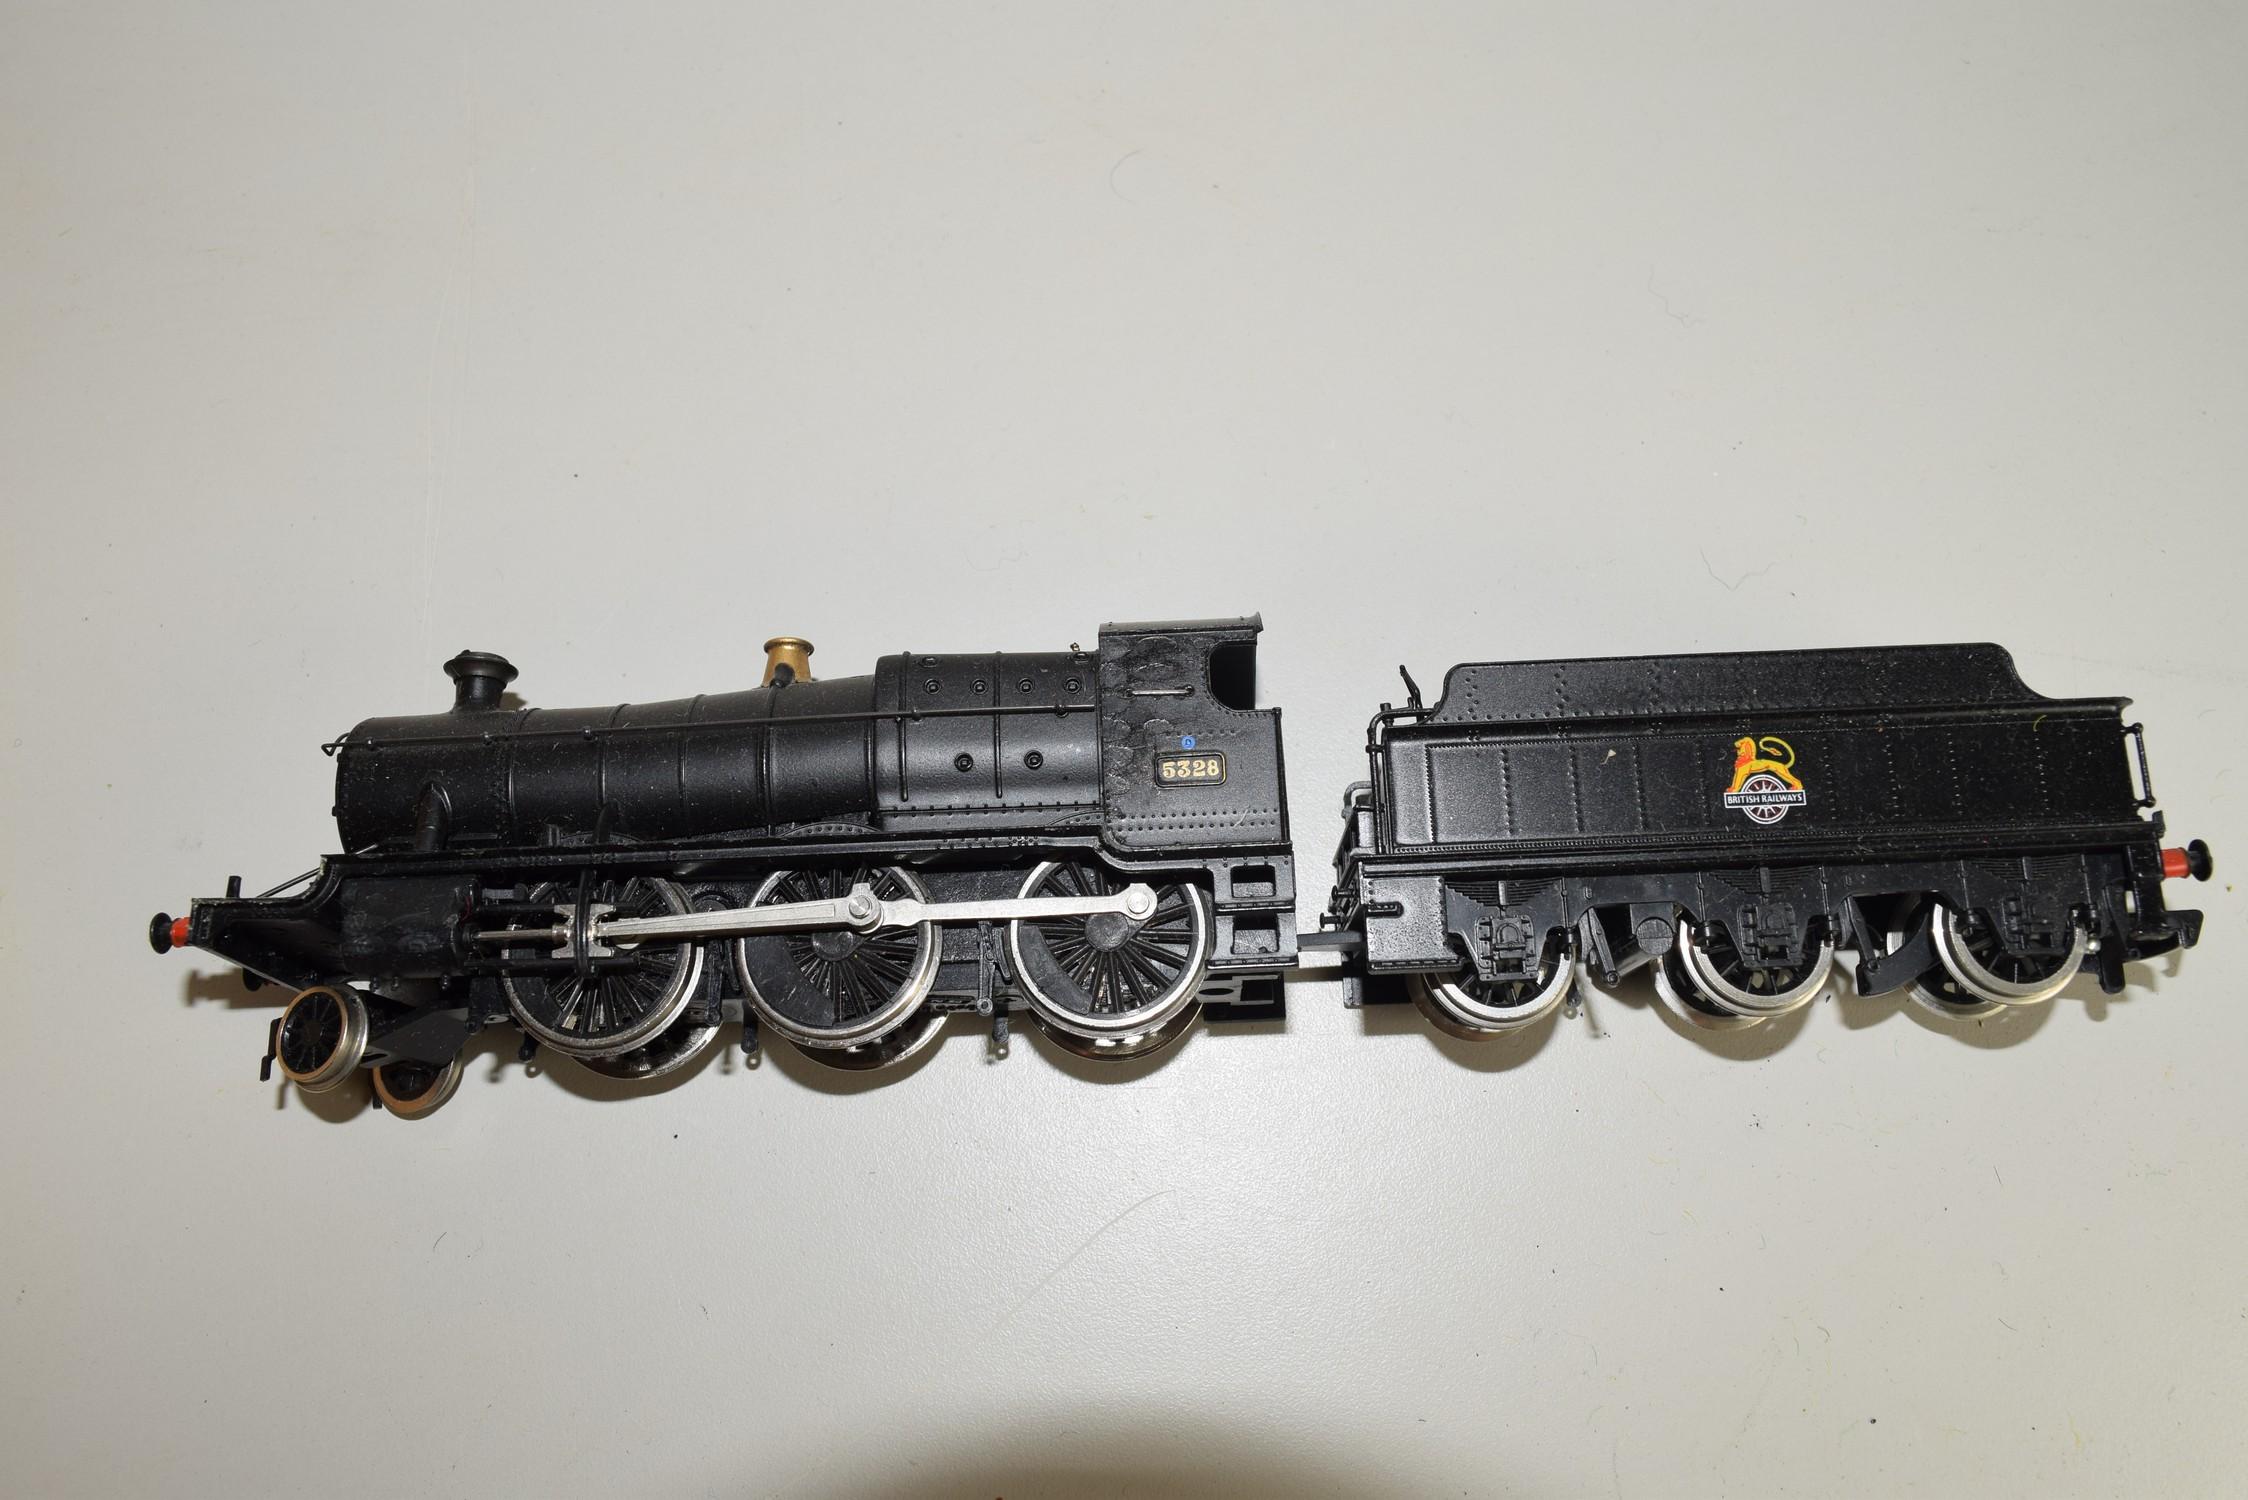 Unboxed Mainline 00 gauge locomotive no 5328